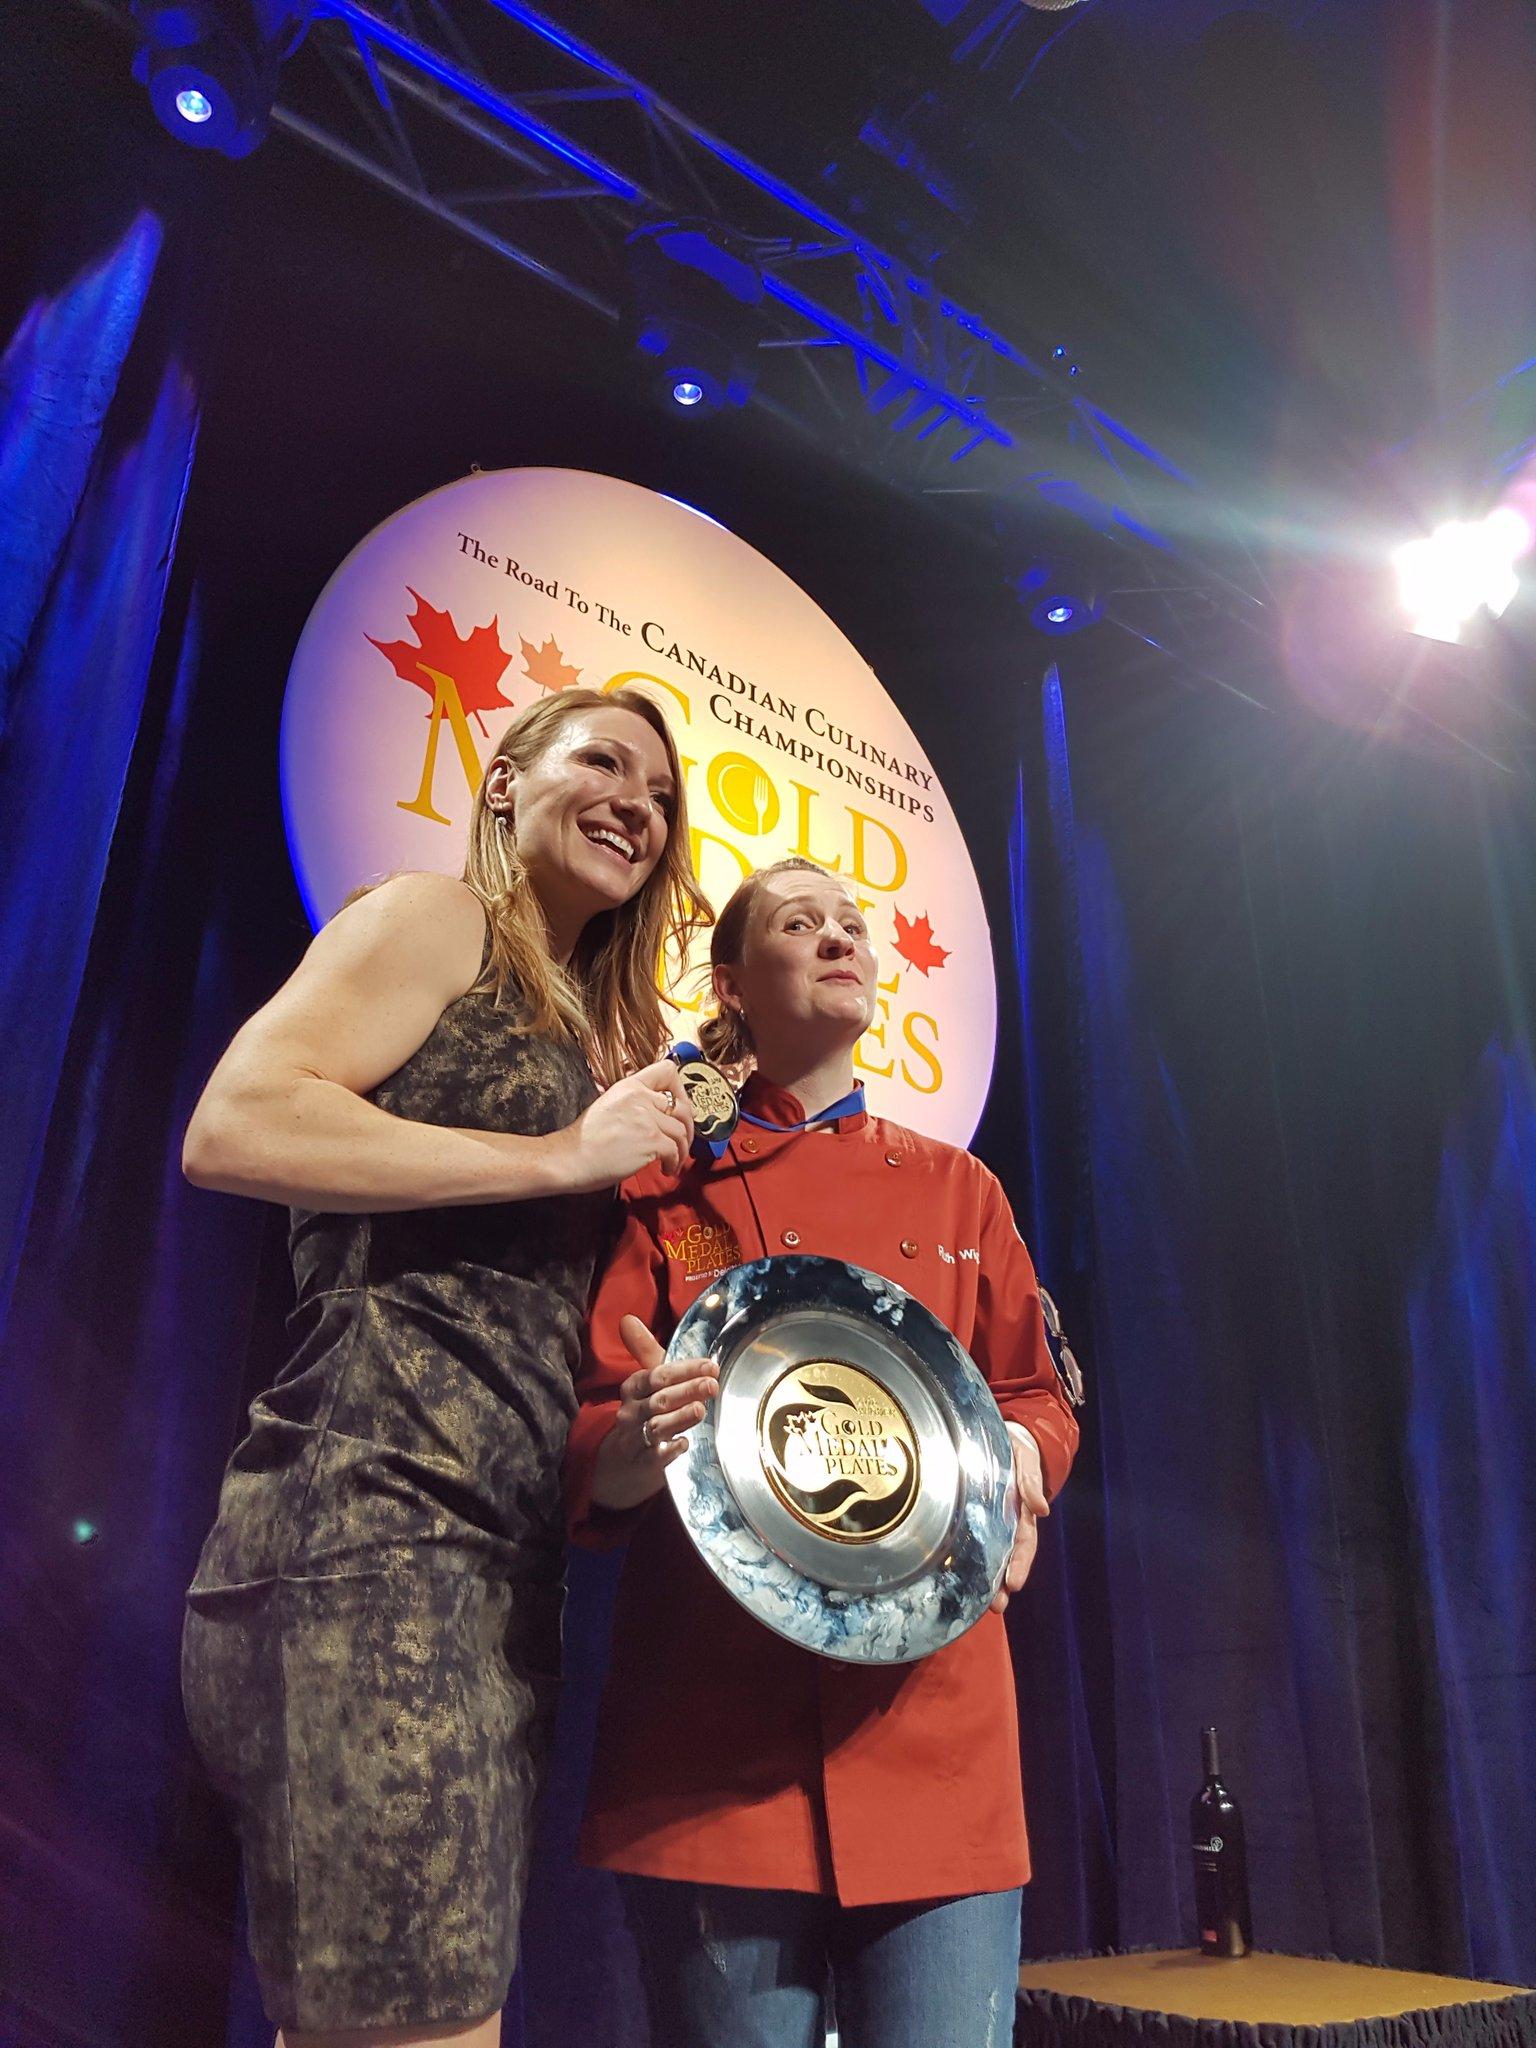 Emcee @HeatherMoyse + #GMPStJohns champion @wigman_ruth. https://t.co/7F1izF6E9Q